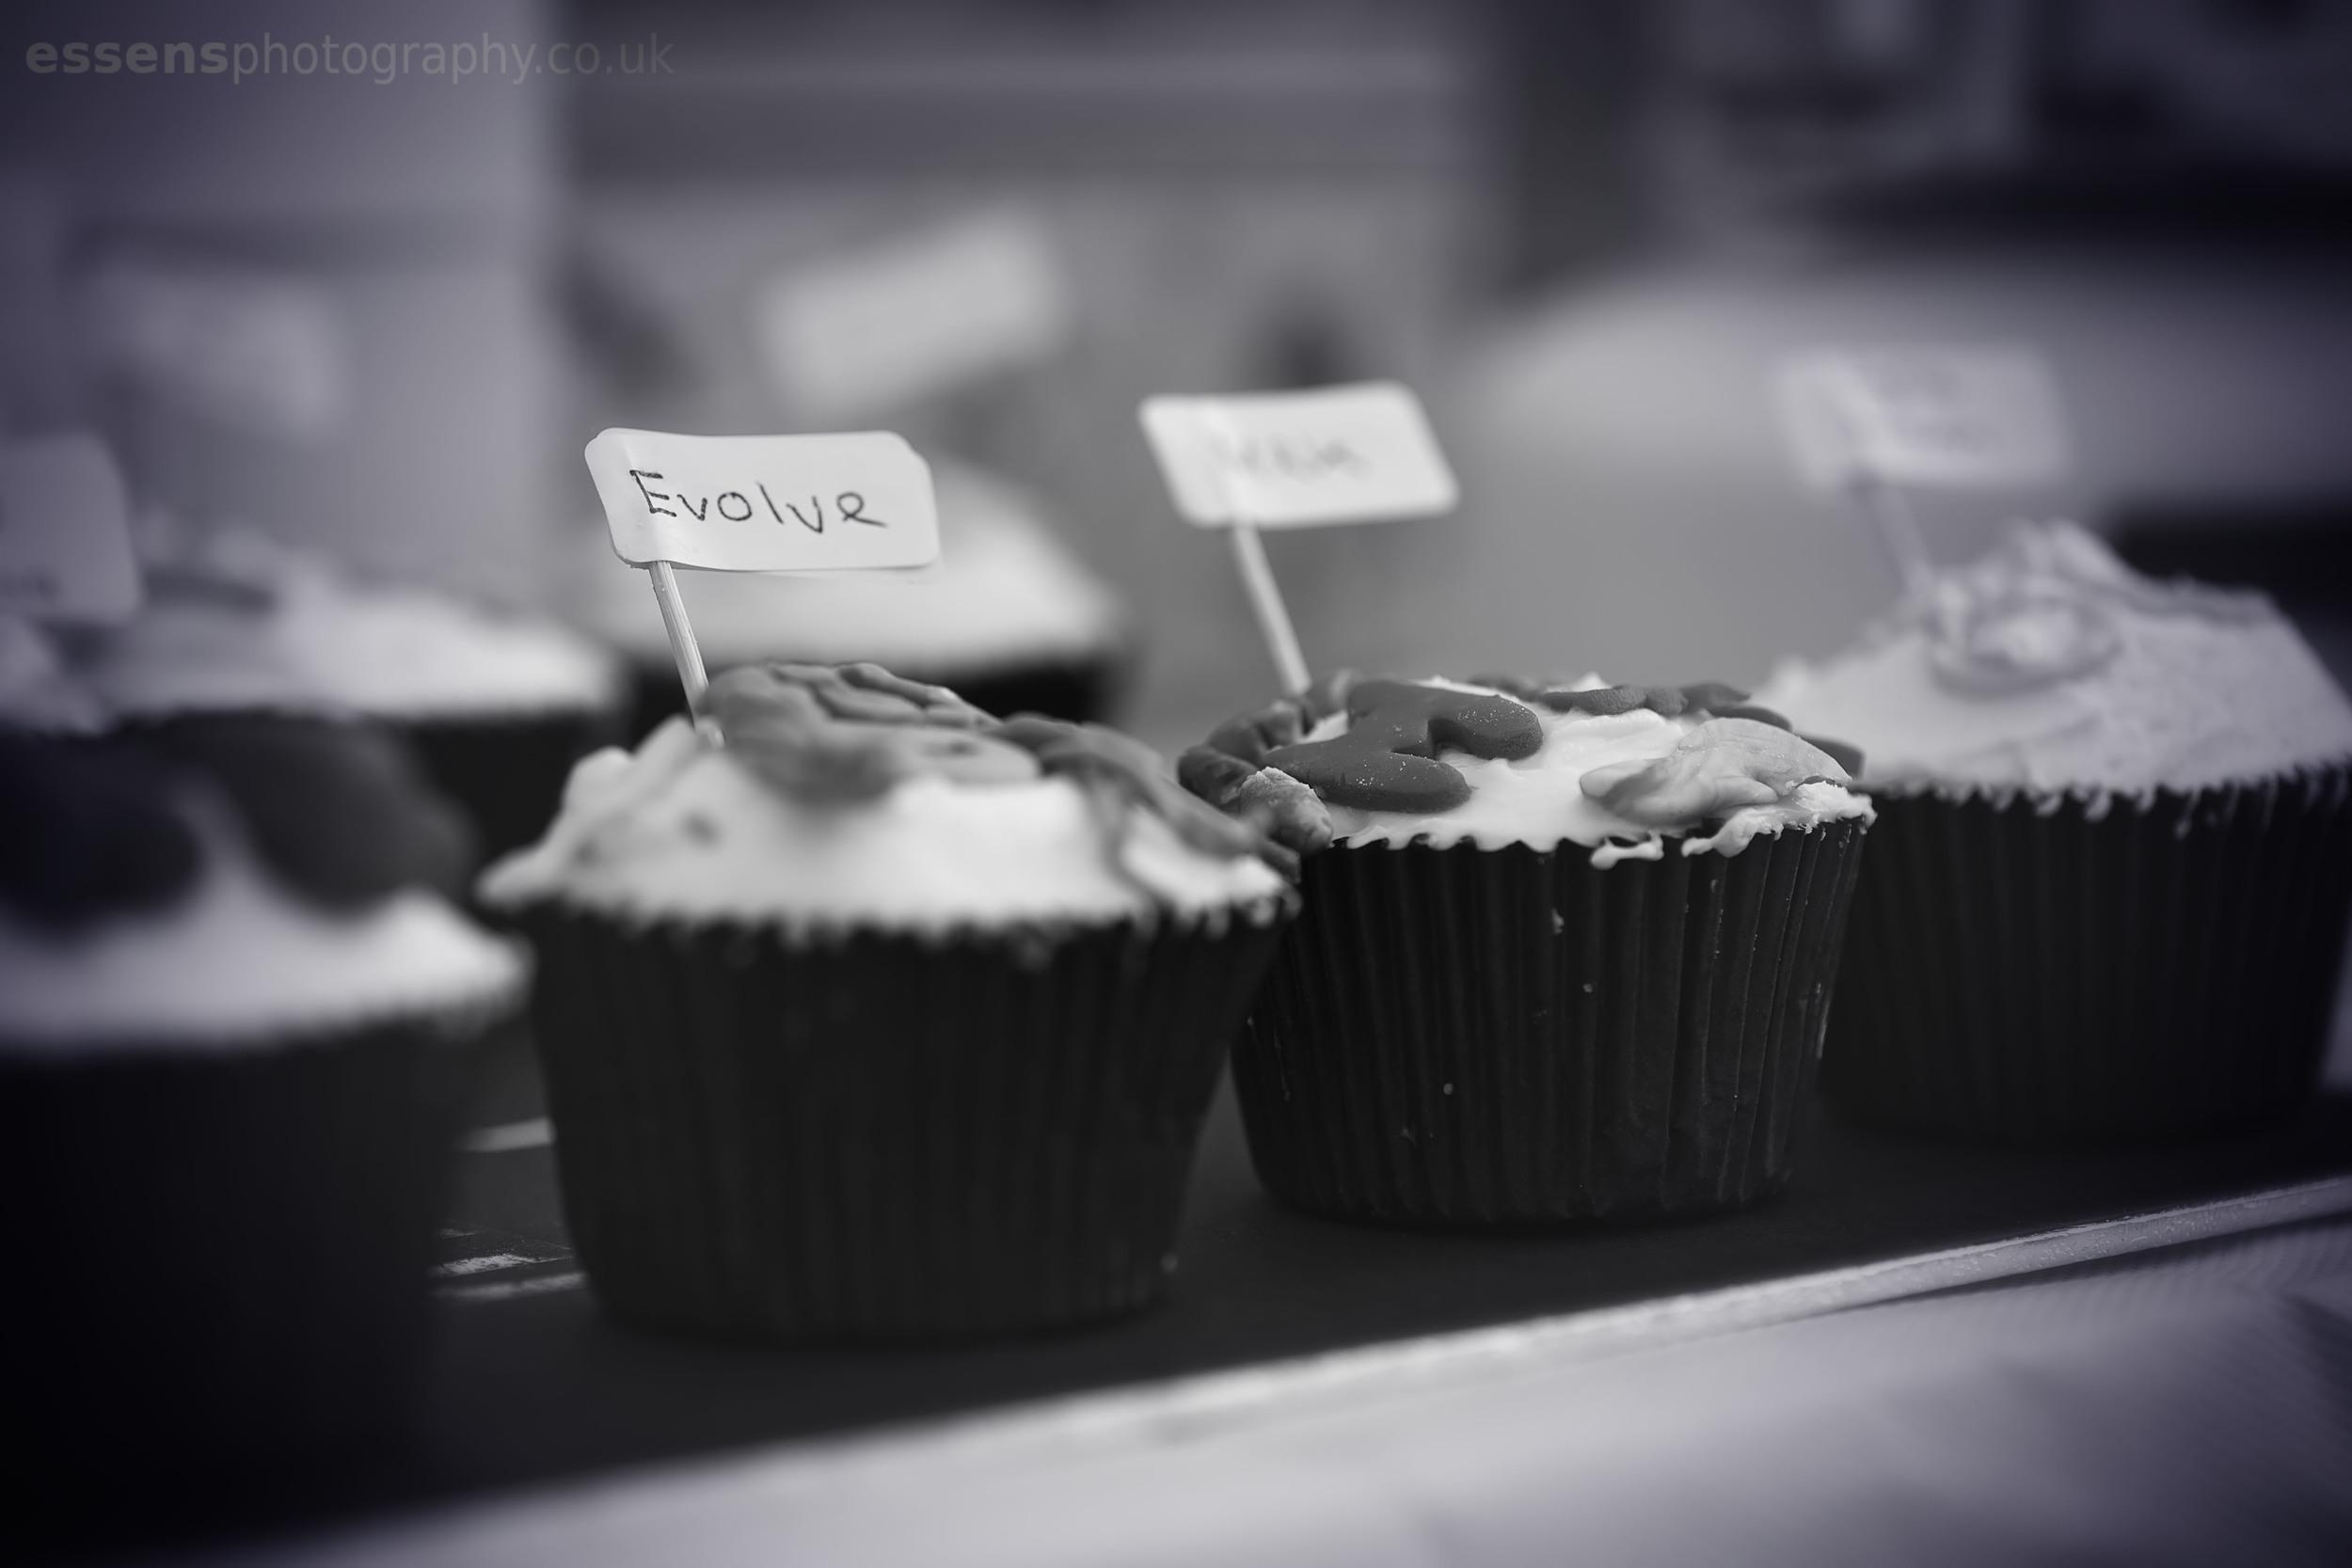 cakes 7.jpg